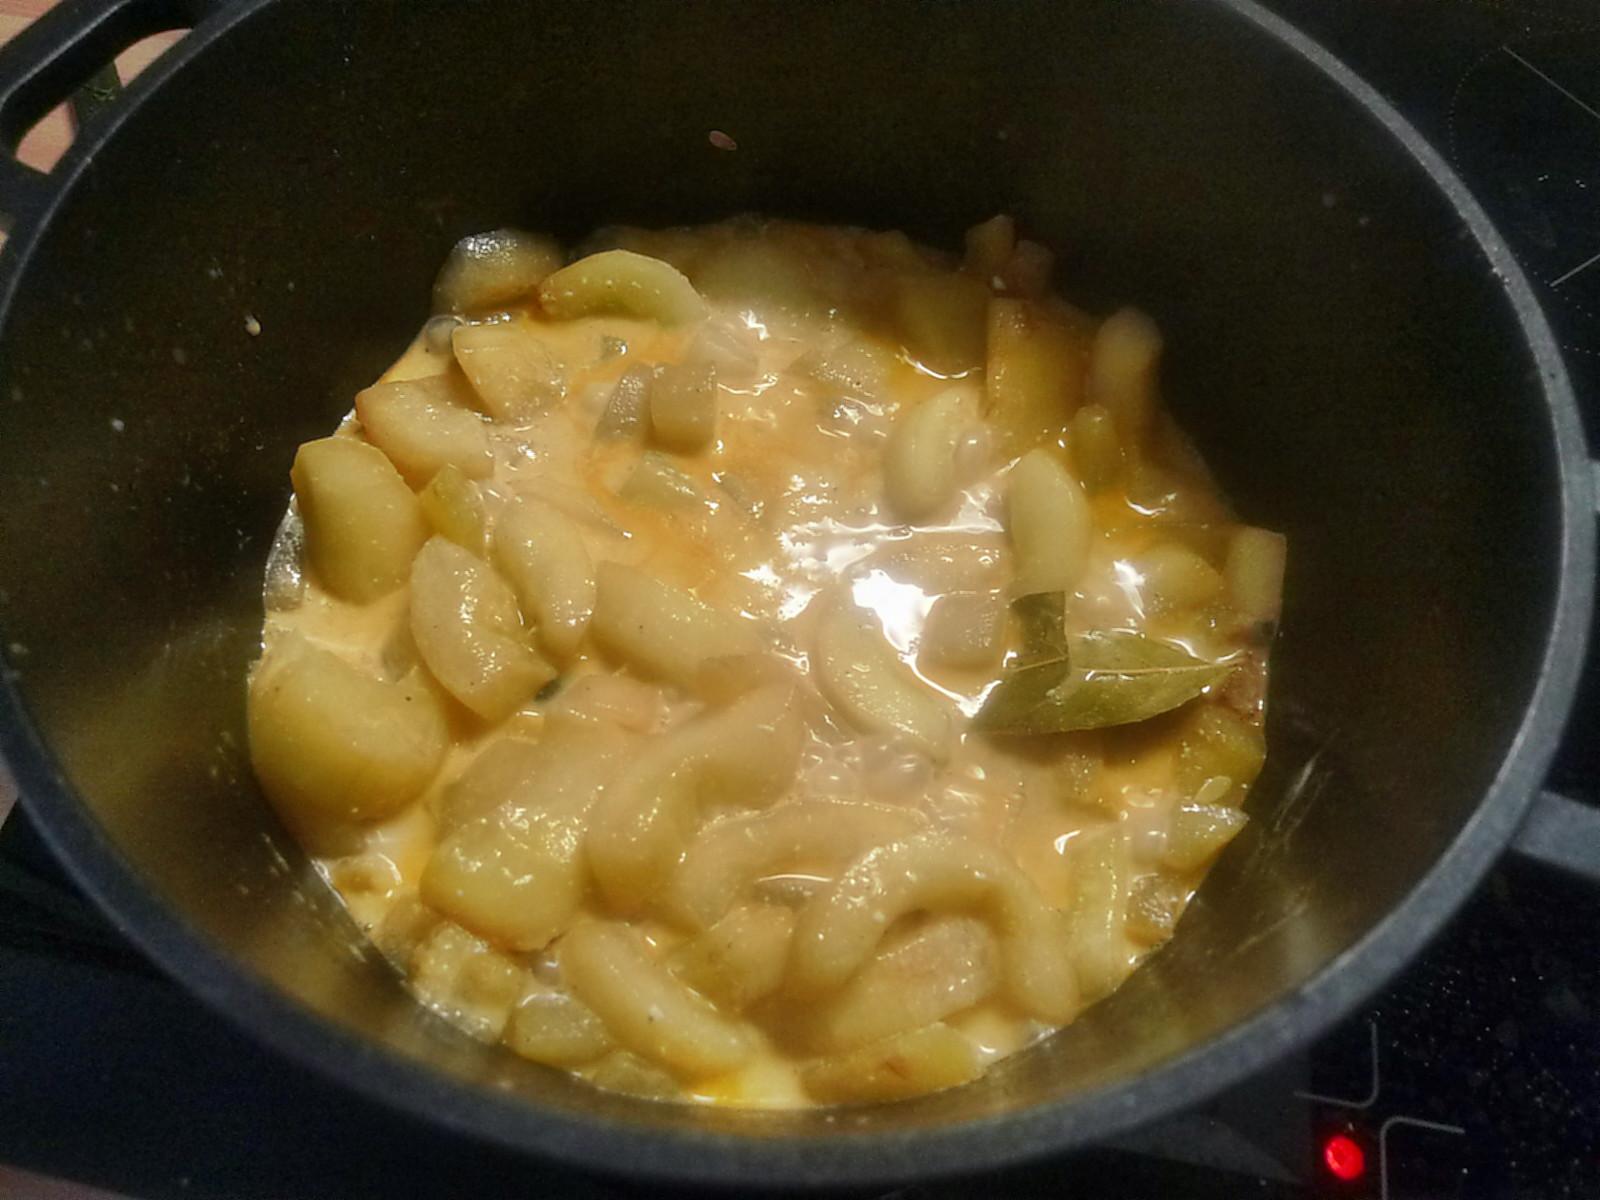 Gurkengemüse-Kartoffel-Mirabellenkompott-8.8.14   (4)